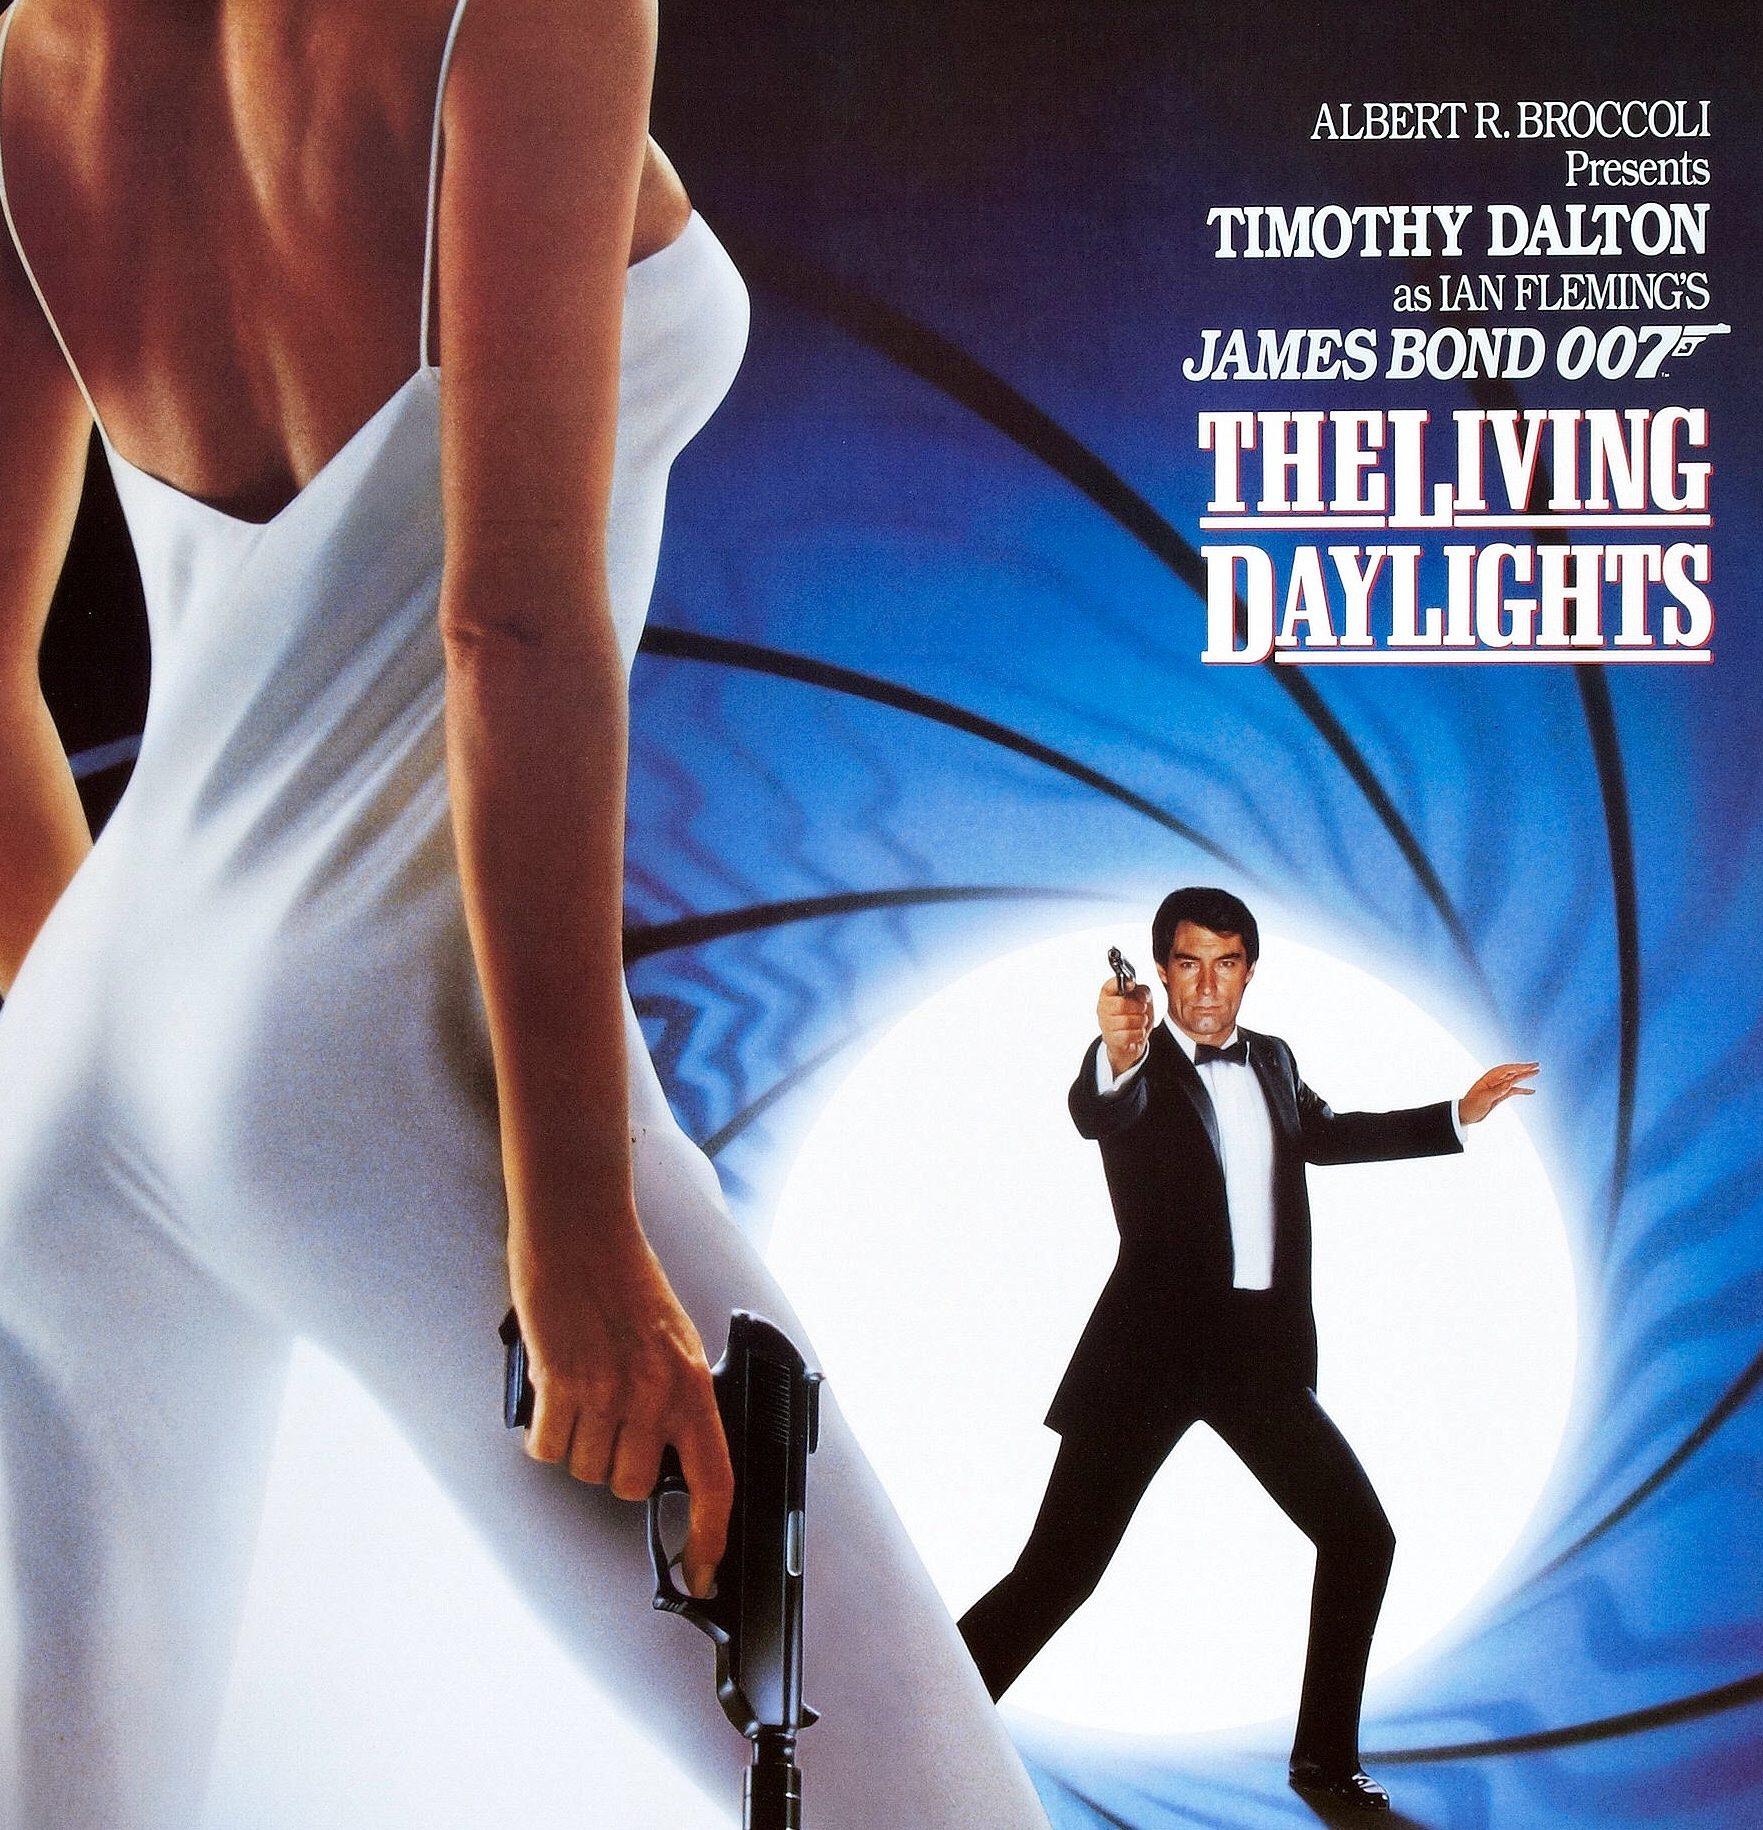 MV5BZjI4MjBmYzItYTY5OC00OWYzLWE0NWYtZDQxNDQxM2QzYjA4XkEyXkFqcGdeQXVyNjc1NTYyMjg@. V1 e1582715274446 11 Of The Best James Bond Movies (And 10 Of The Worst)